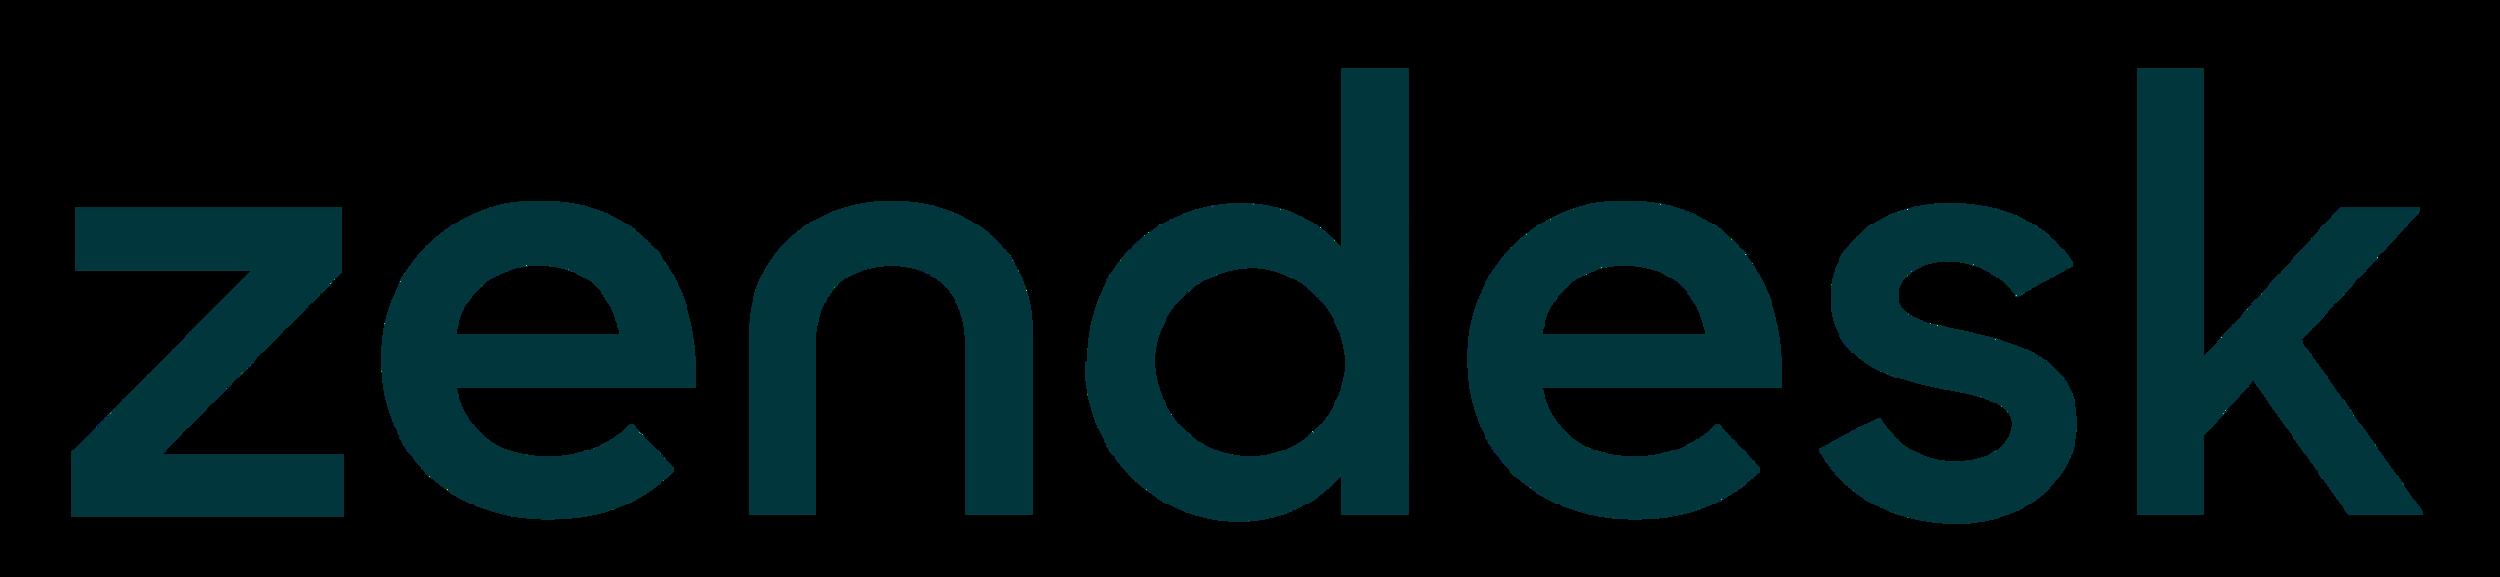 zendesk_logo.png